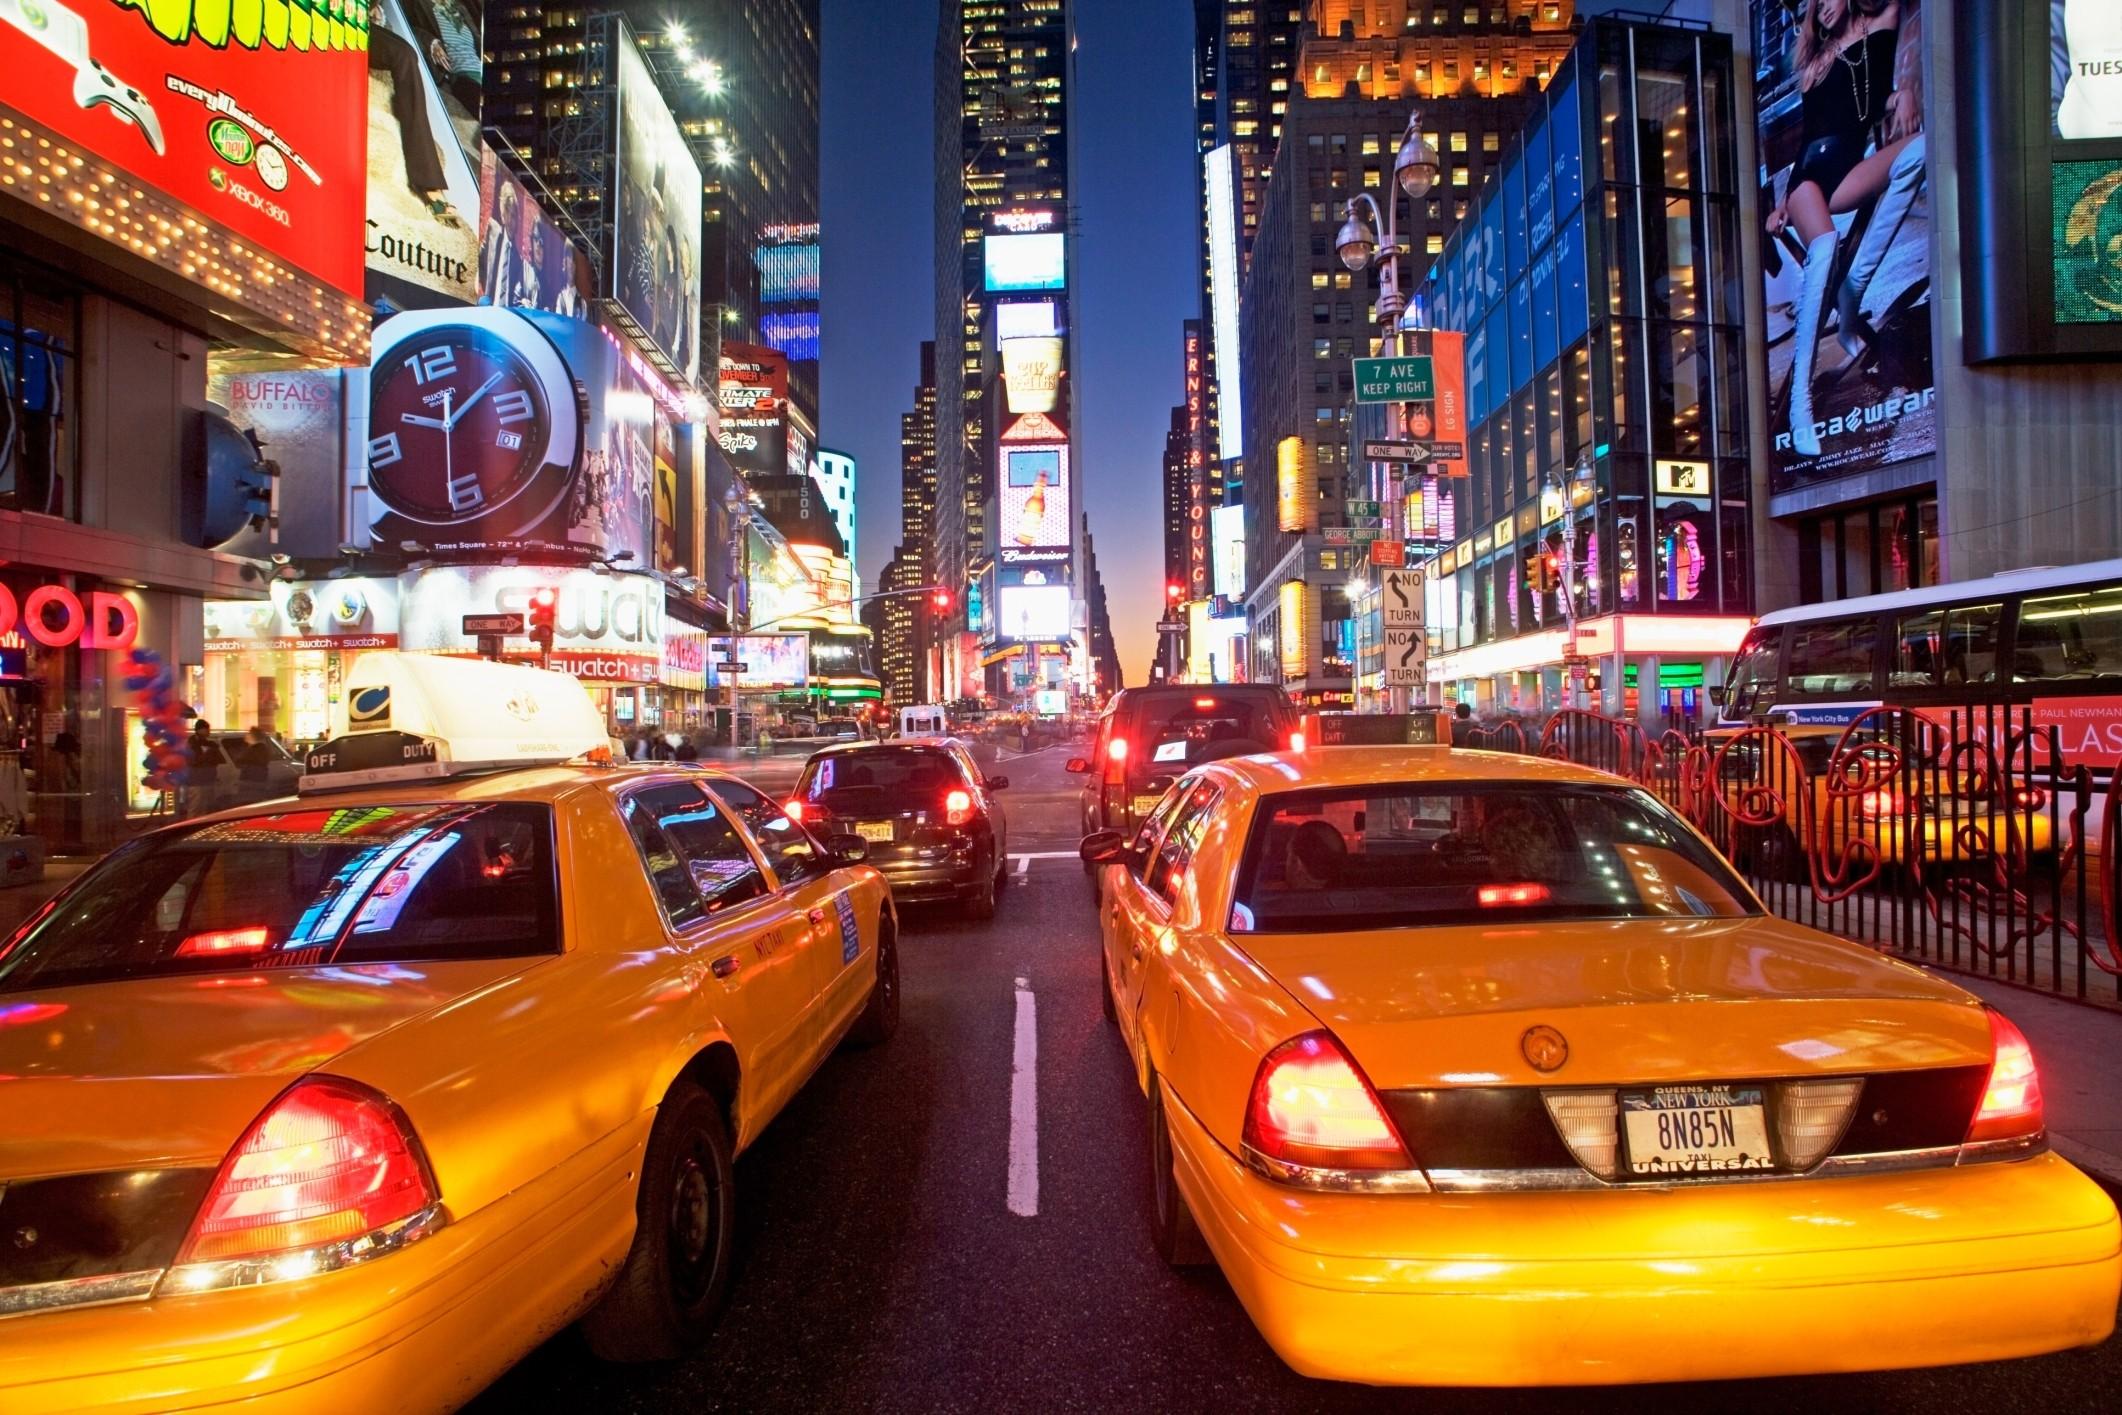 BritishAirways_New_York_City_Cab.jpg